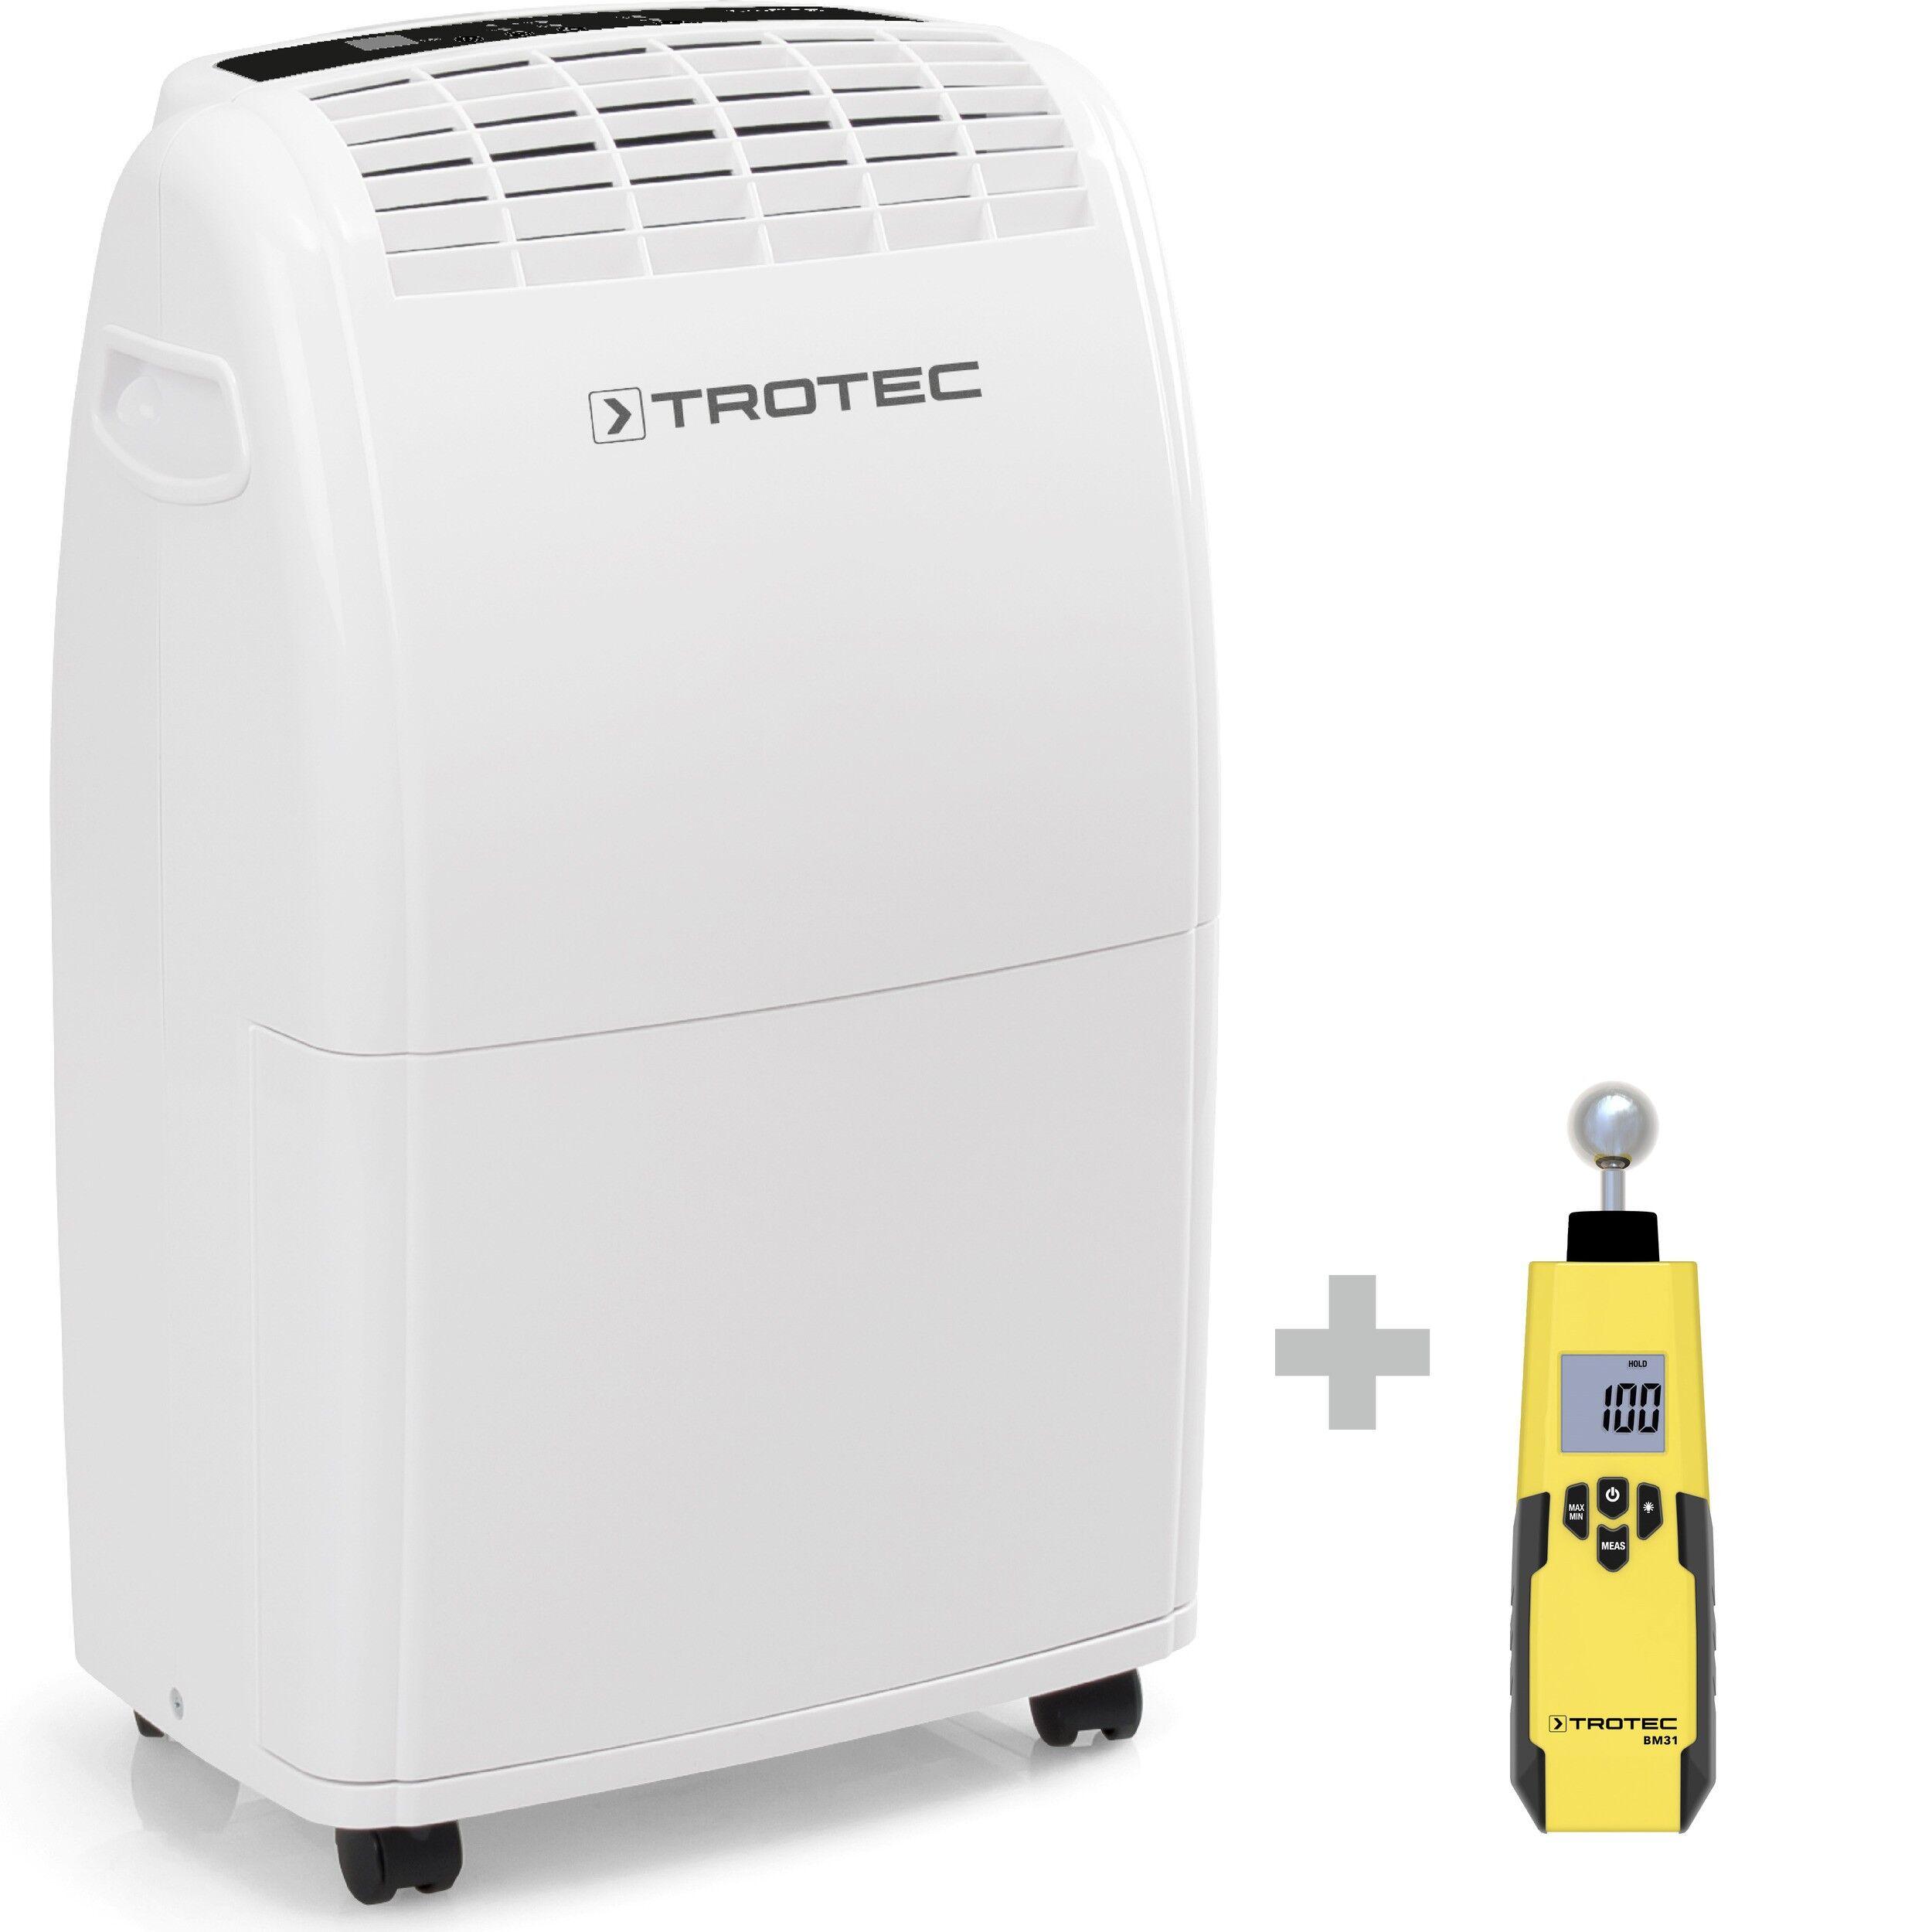 trotec deumidificatore ttk 75 e + indicatore di umidità bm31